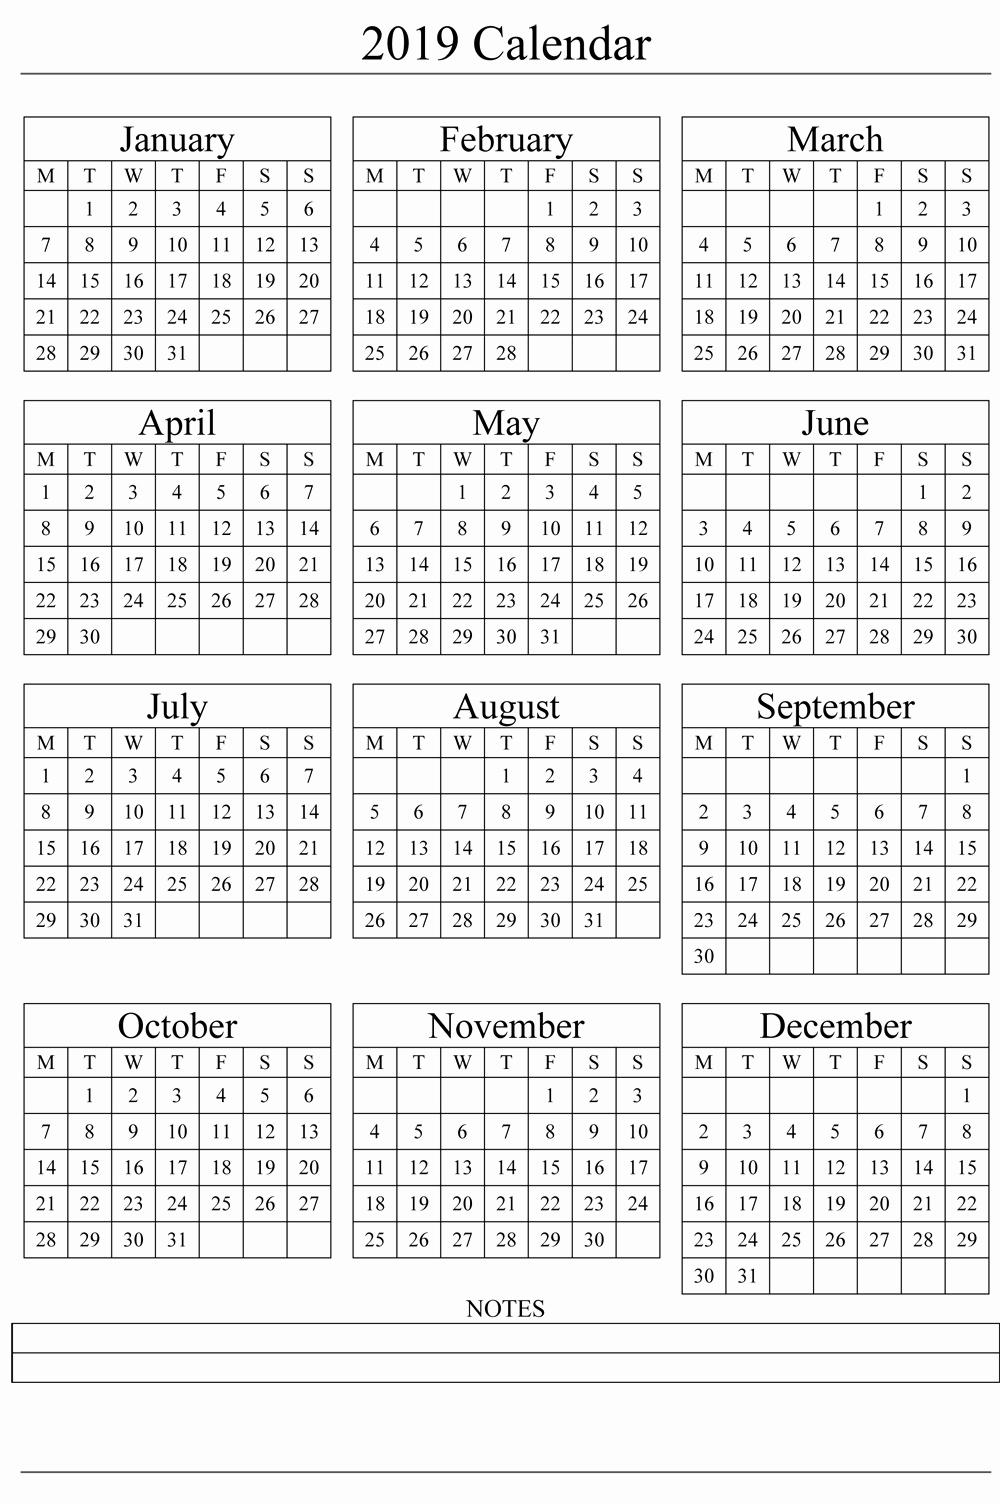 2019 attendance Calendar Free Inspirational 2019 Printable Calendar Templates [free]